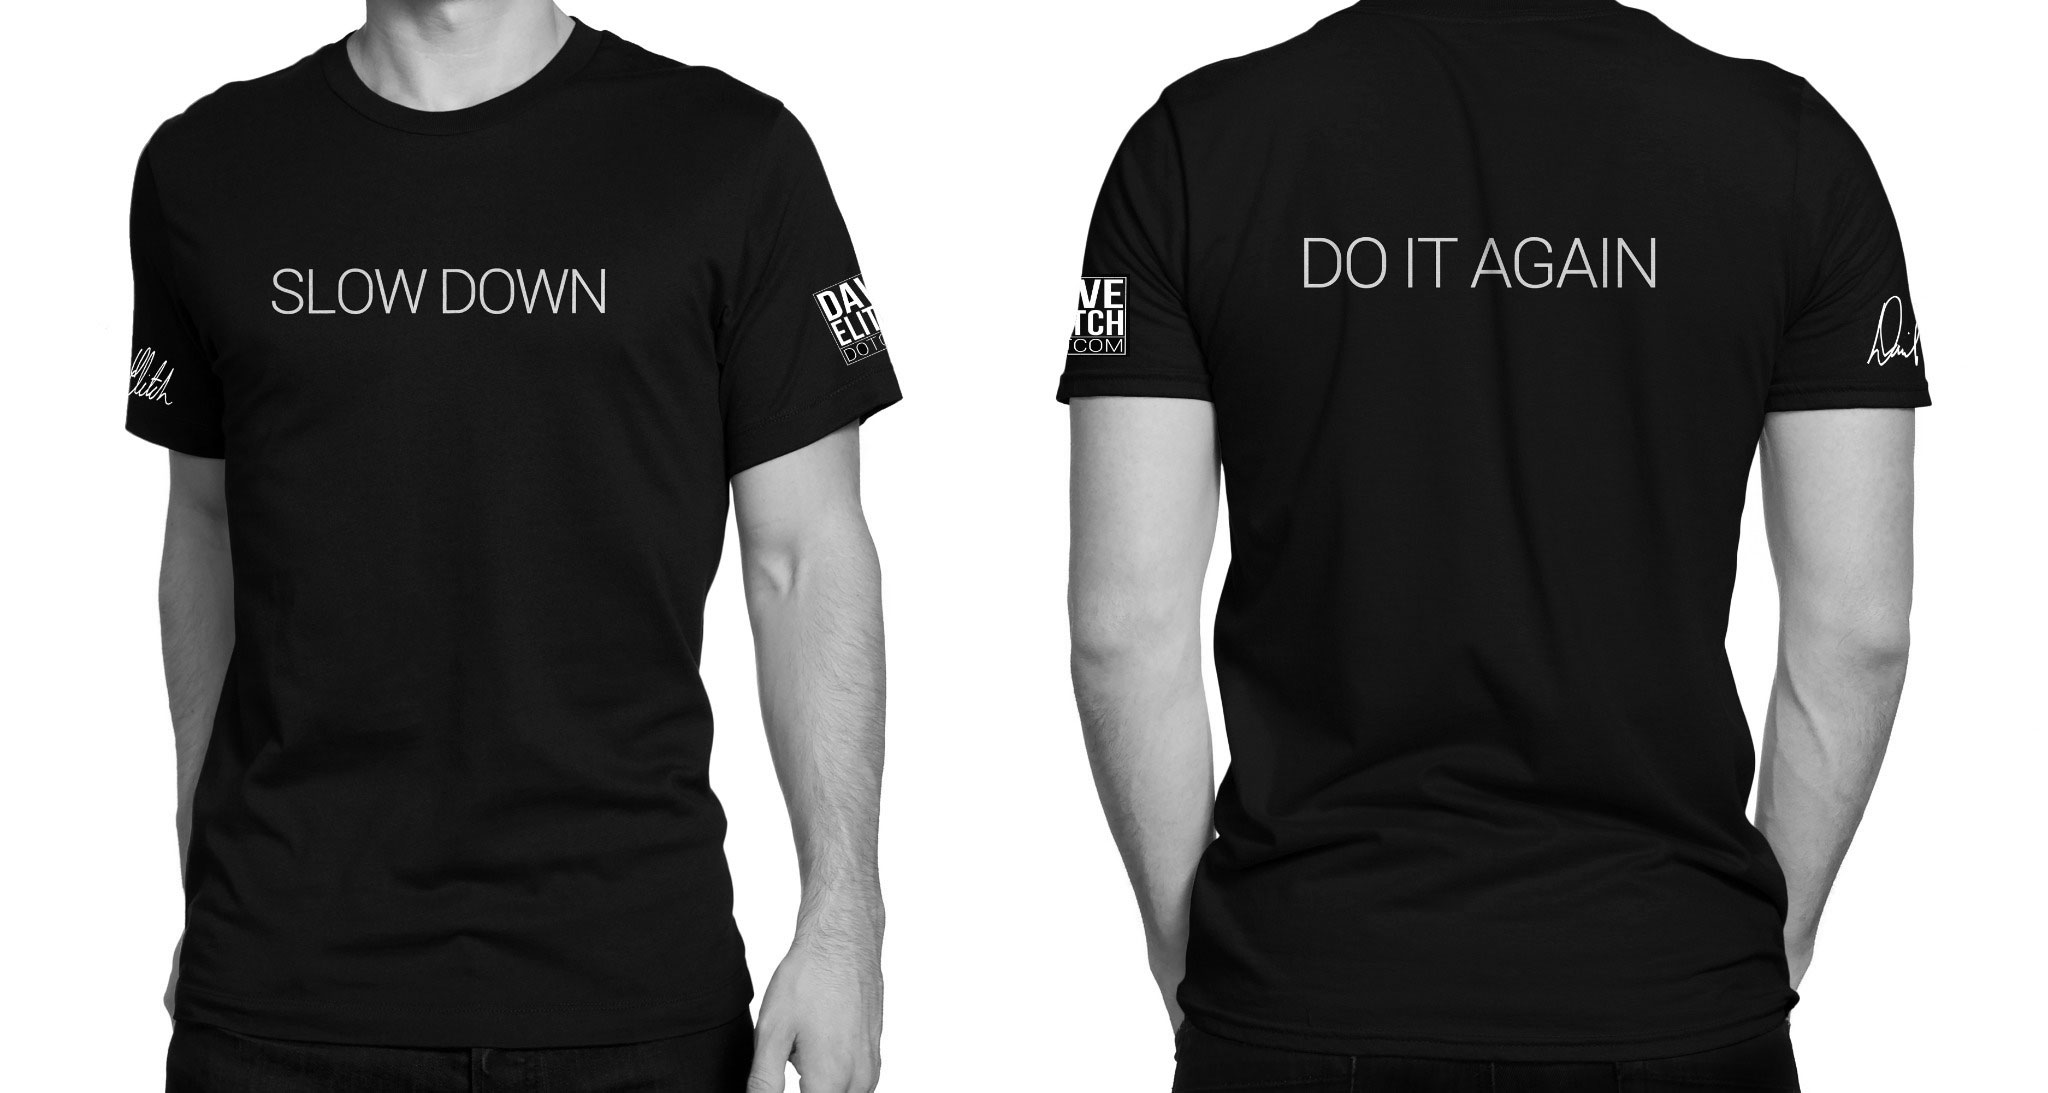 slowdown-bw.jpg